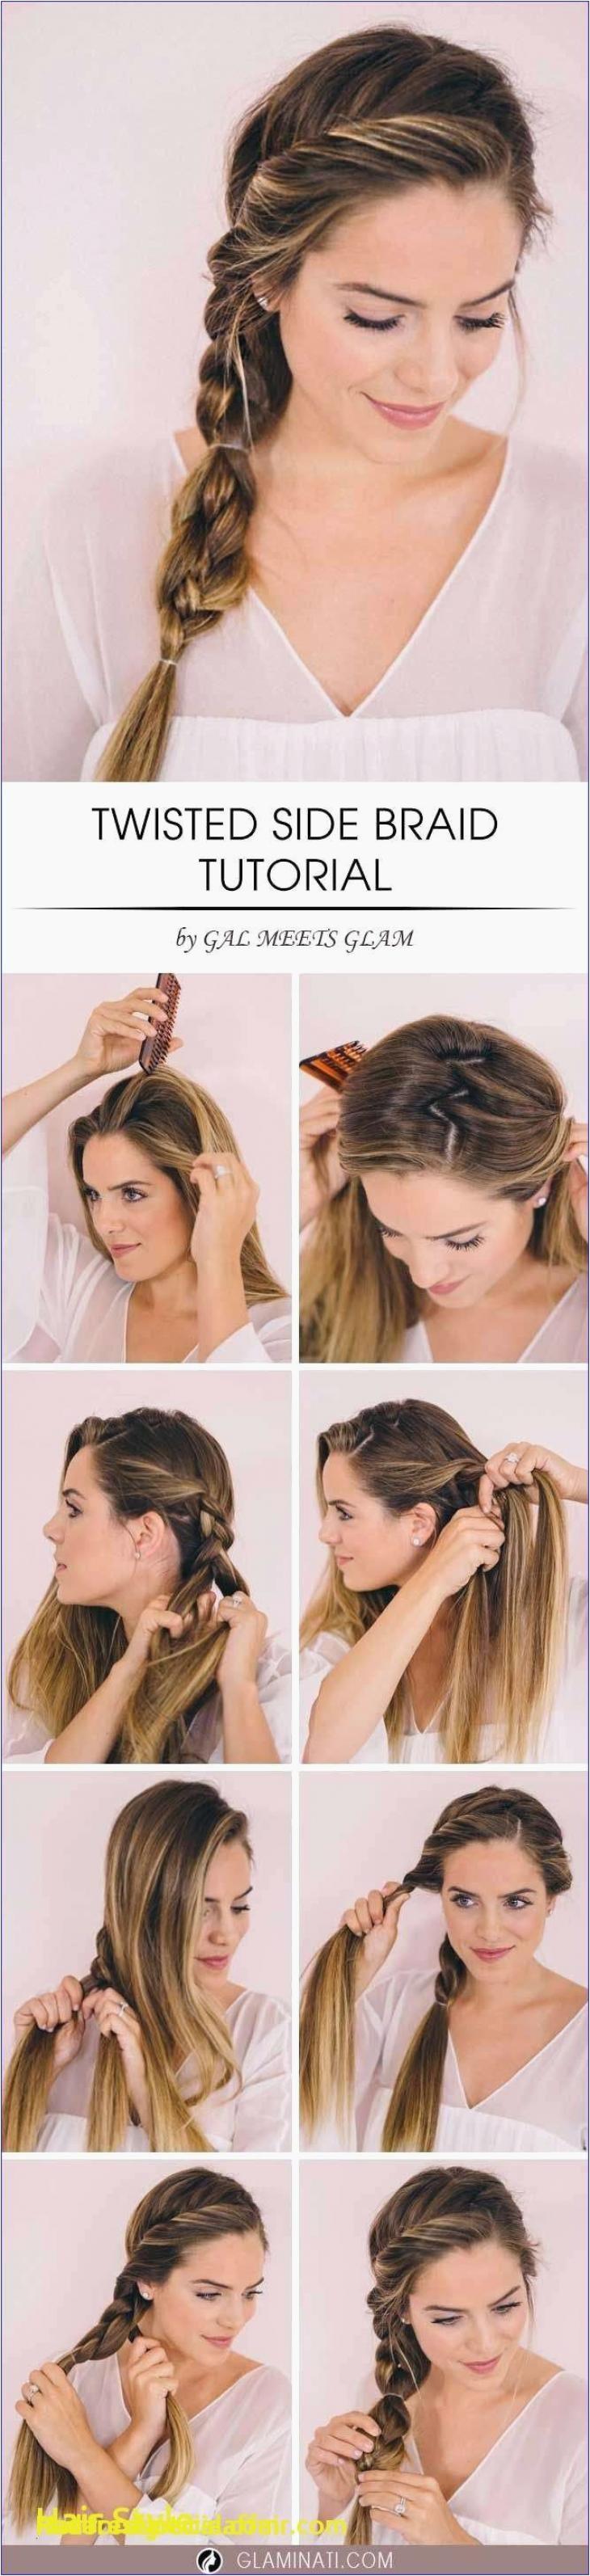 Braid Hairstyles for Girls Easy Beautiful Beautiful Easy Hairstyles Step by Step with Braid Hairstyles